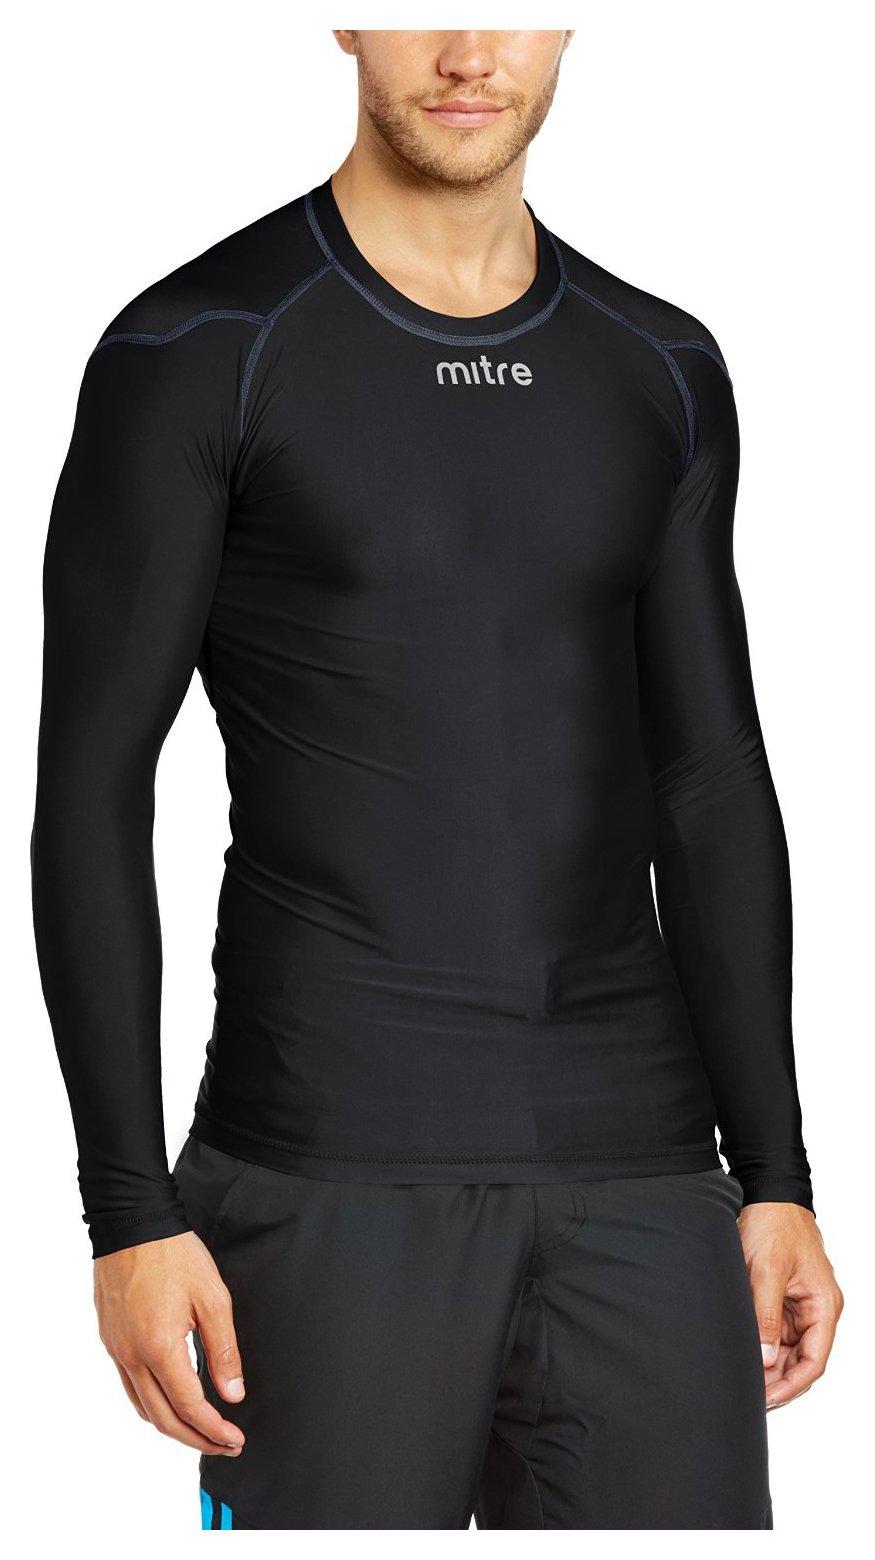 Image of Mitre Base Layer Jersey Black - Medium.